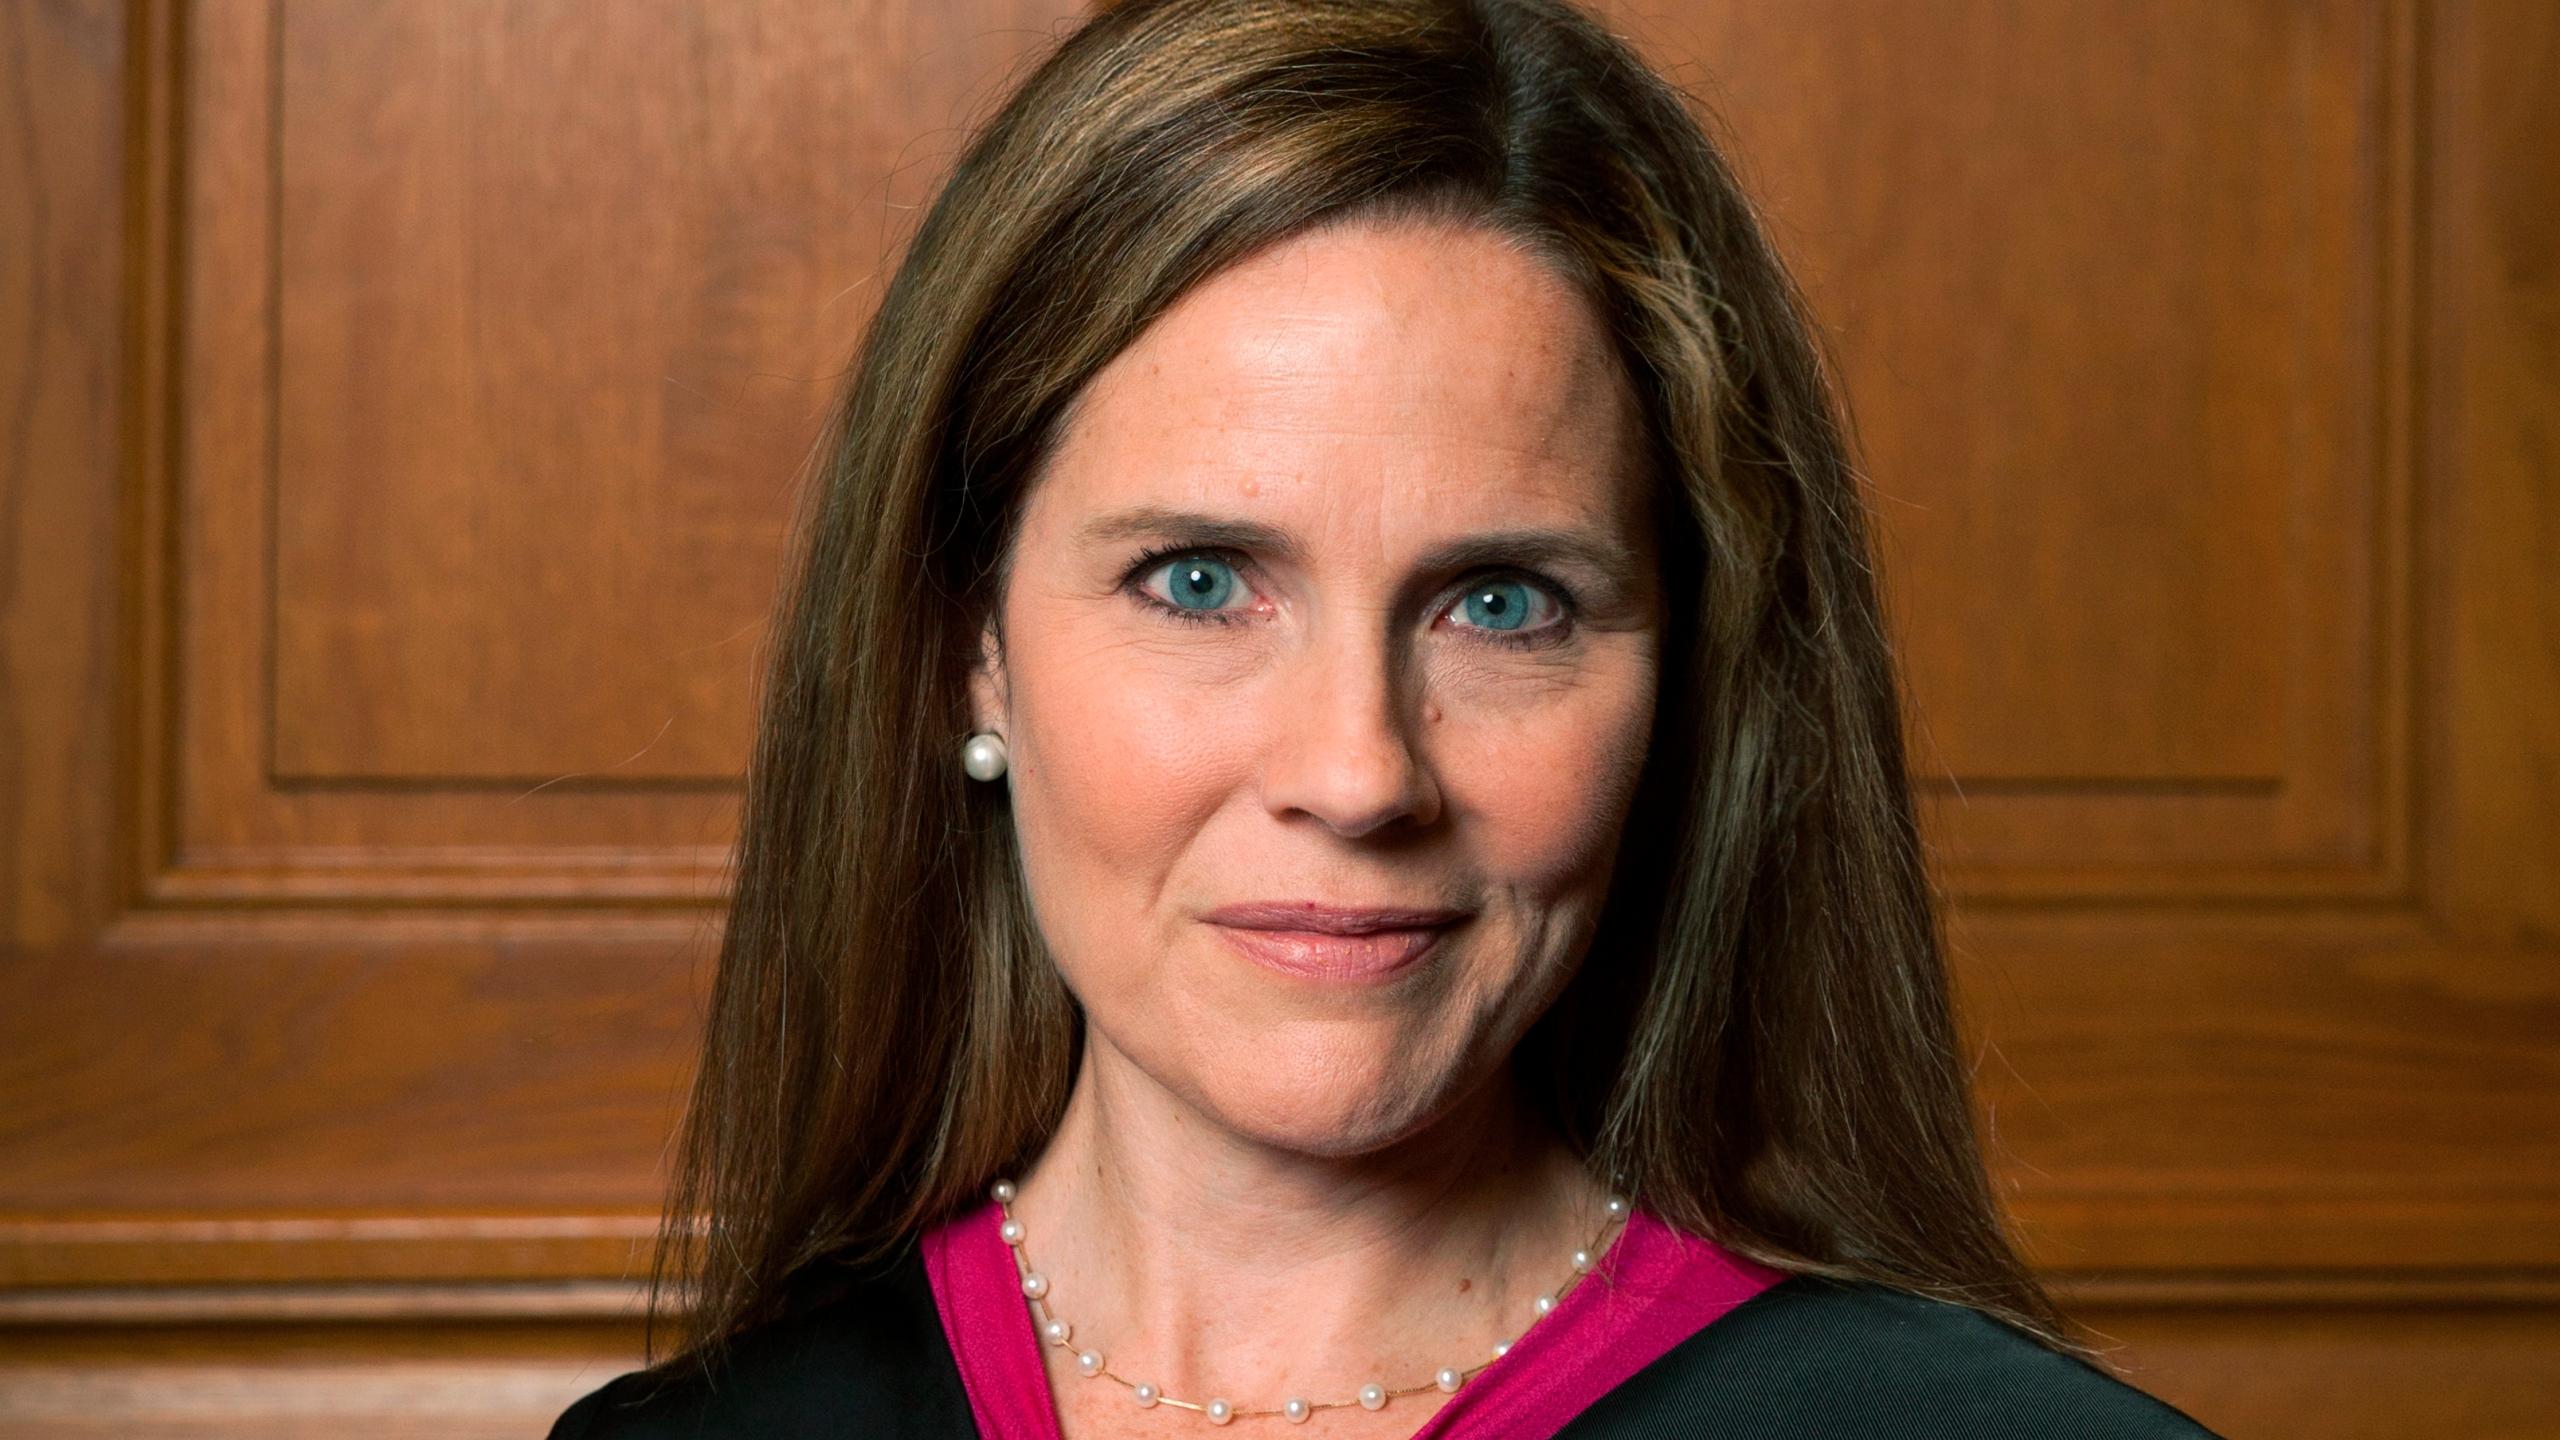 This image provided by Rachel Malehorn shows Judge Amy Coney Barrett in Milwaukee, on Aug. 24, 2018. (Rachel Malehorn, via Associated Press)